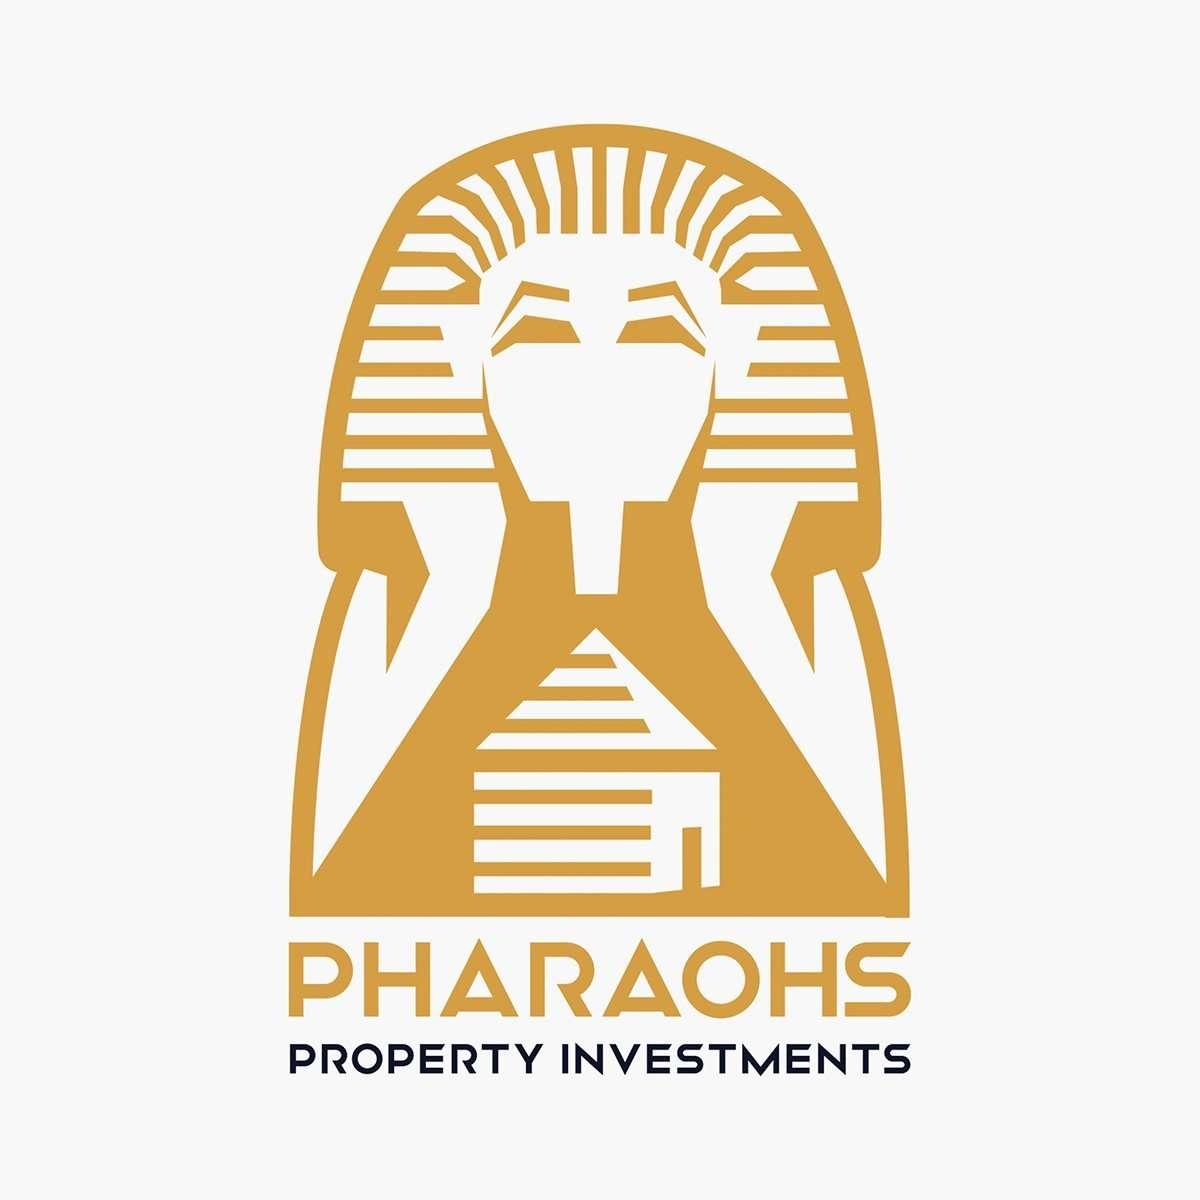 Property investment logo design by BrandSwan, a Delaware branding agency